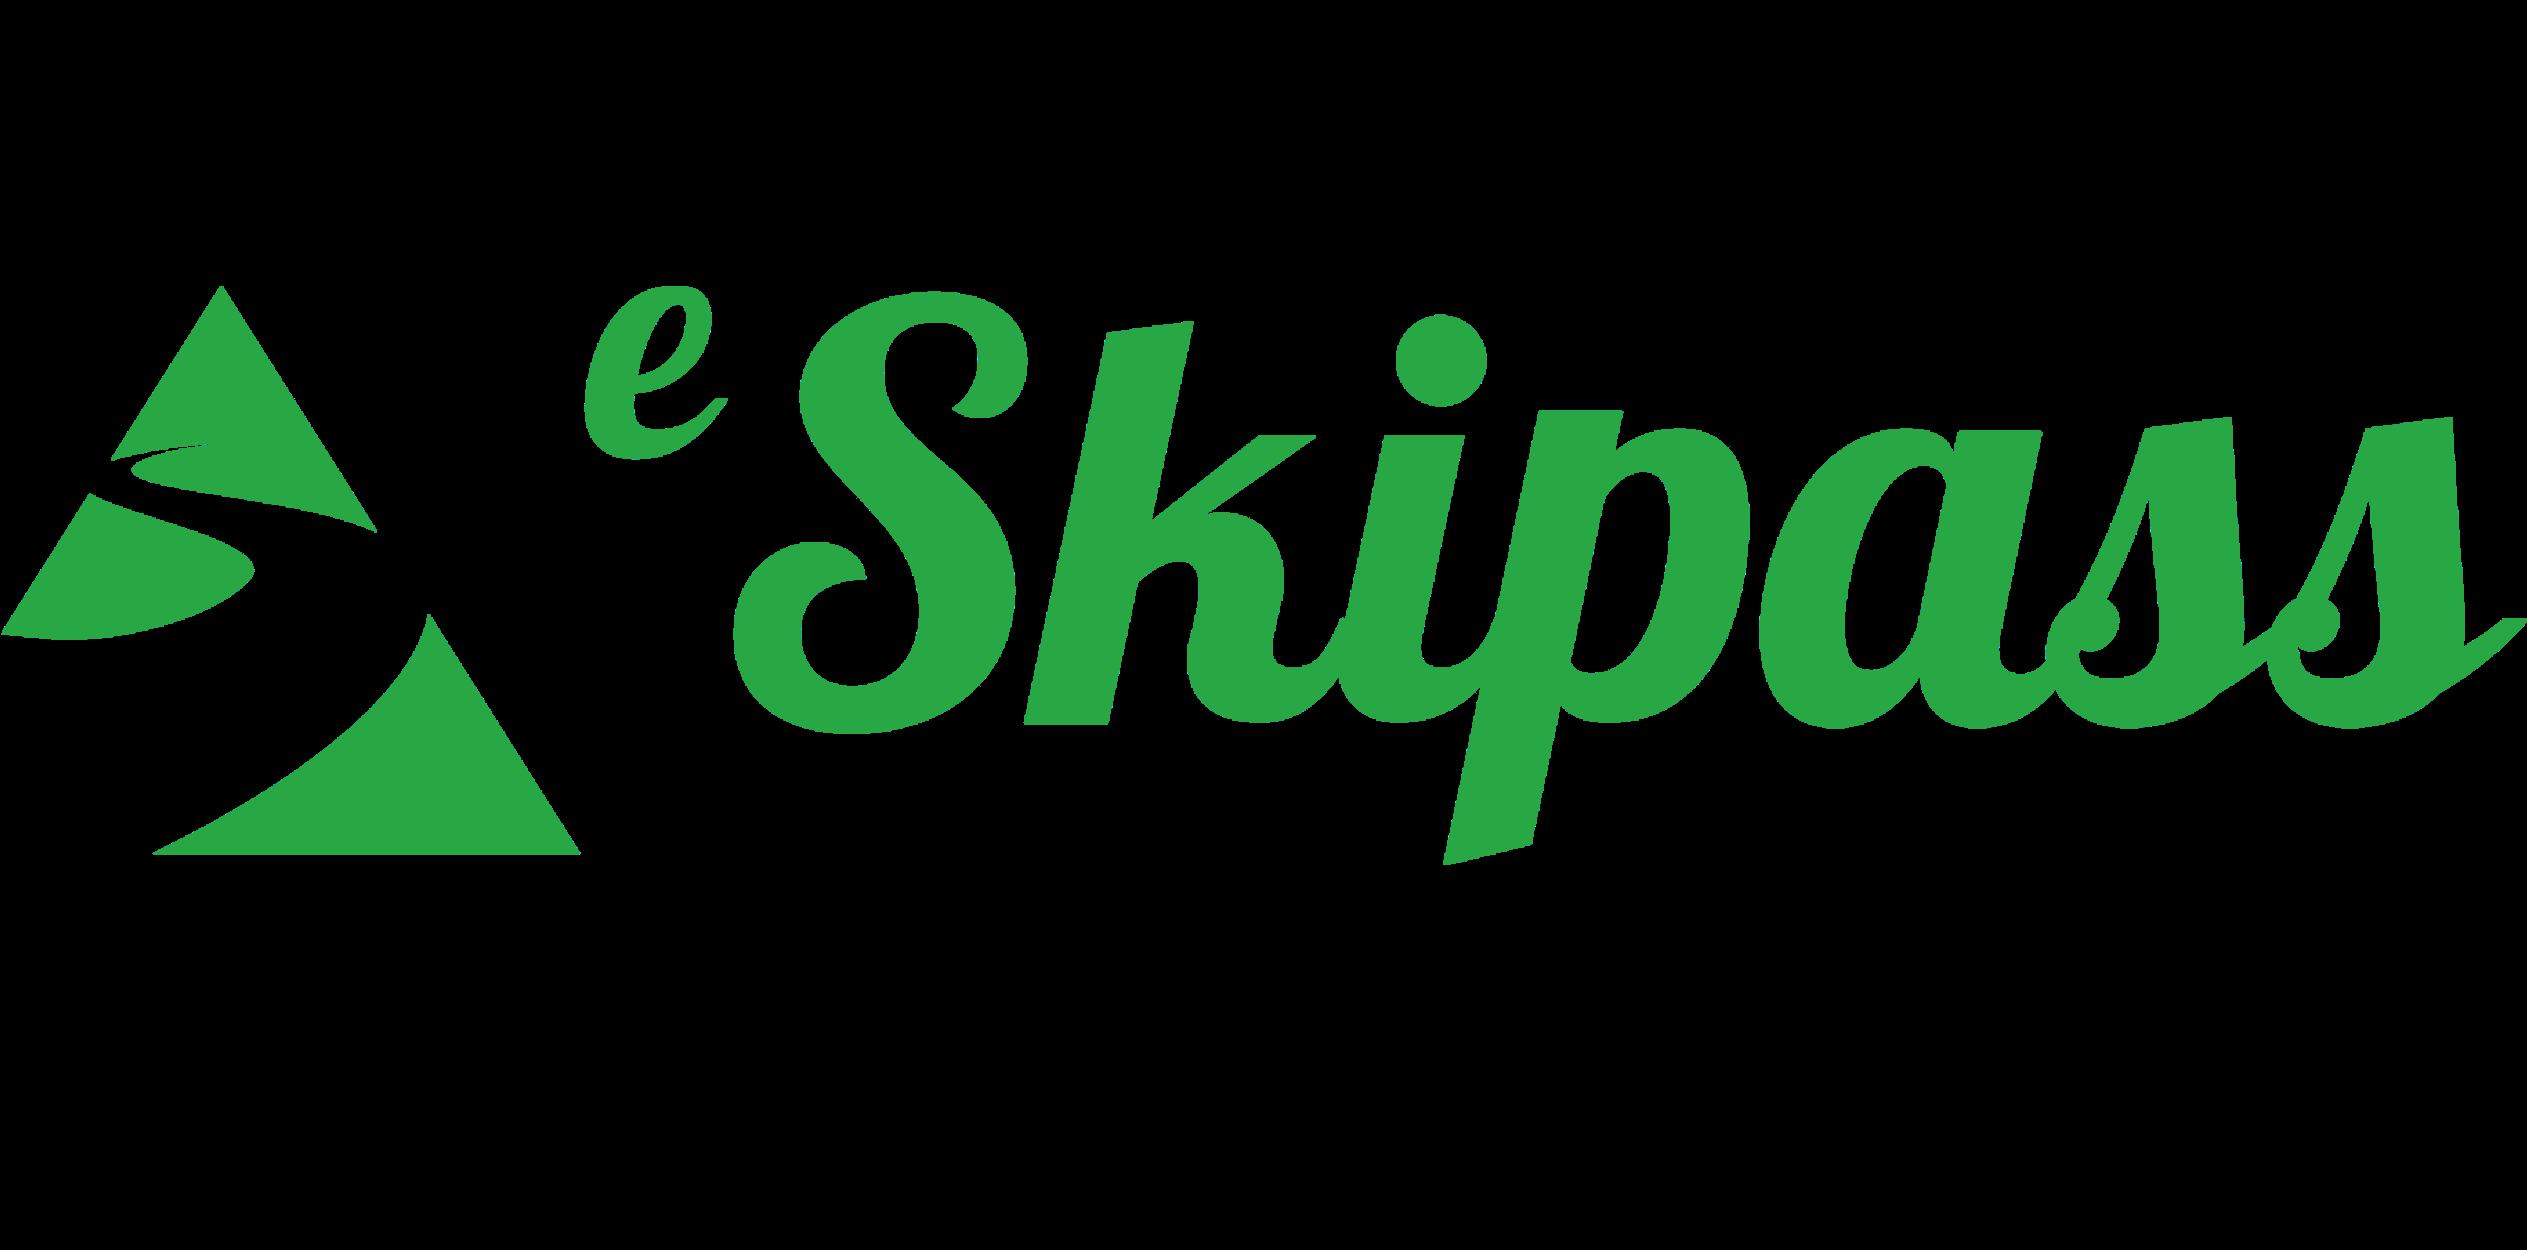 Eskipass Logo